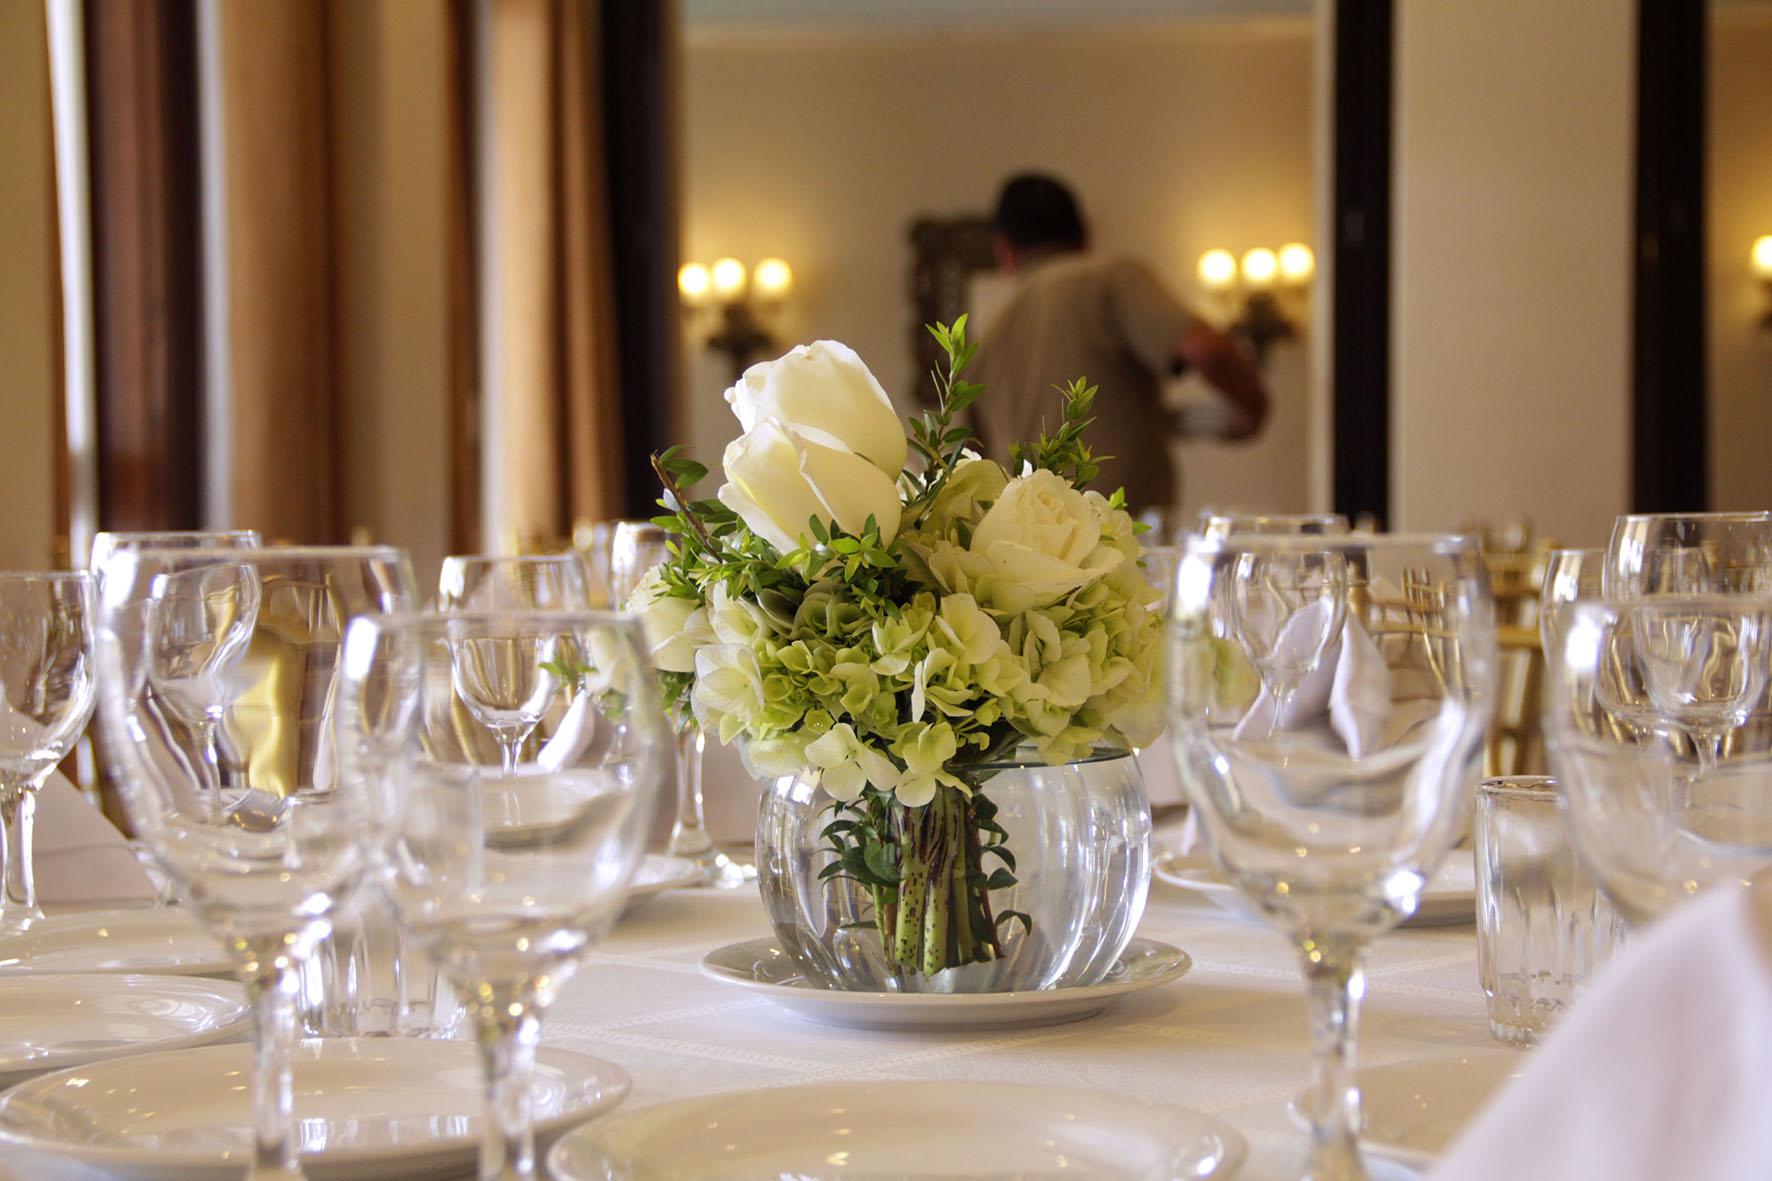 Five Centerpiece Ideas for your Wedding Reception #2